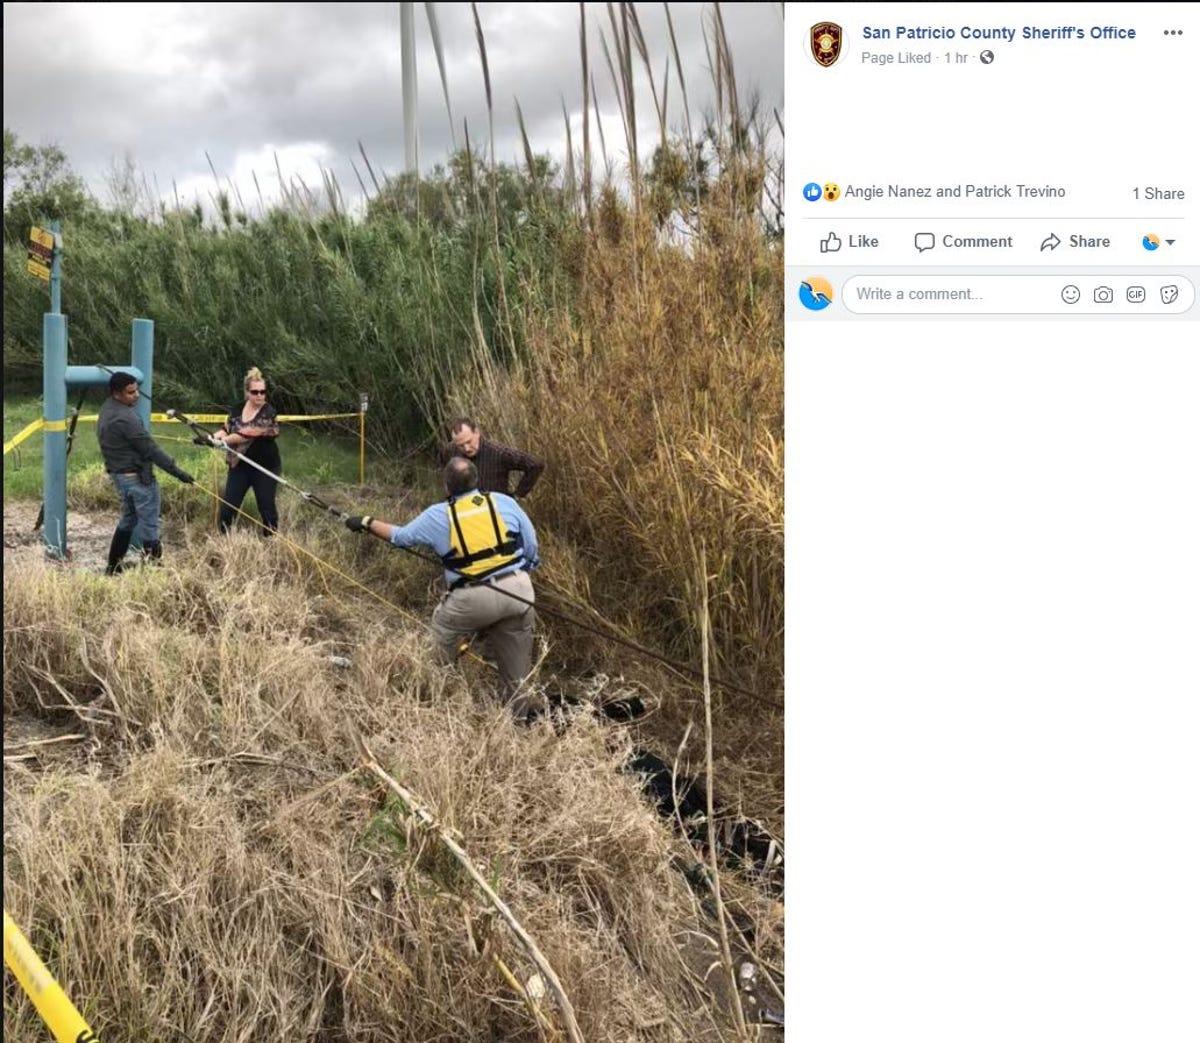 San Patricio County Sheriff's Office IDs man found dead in creek